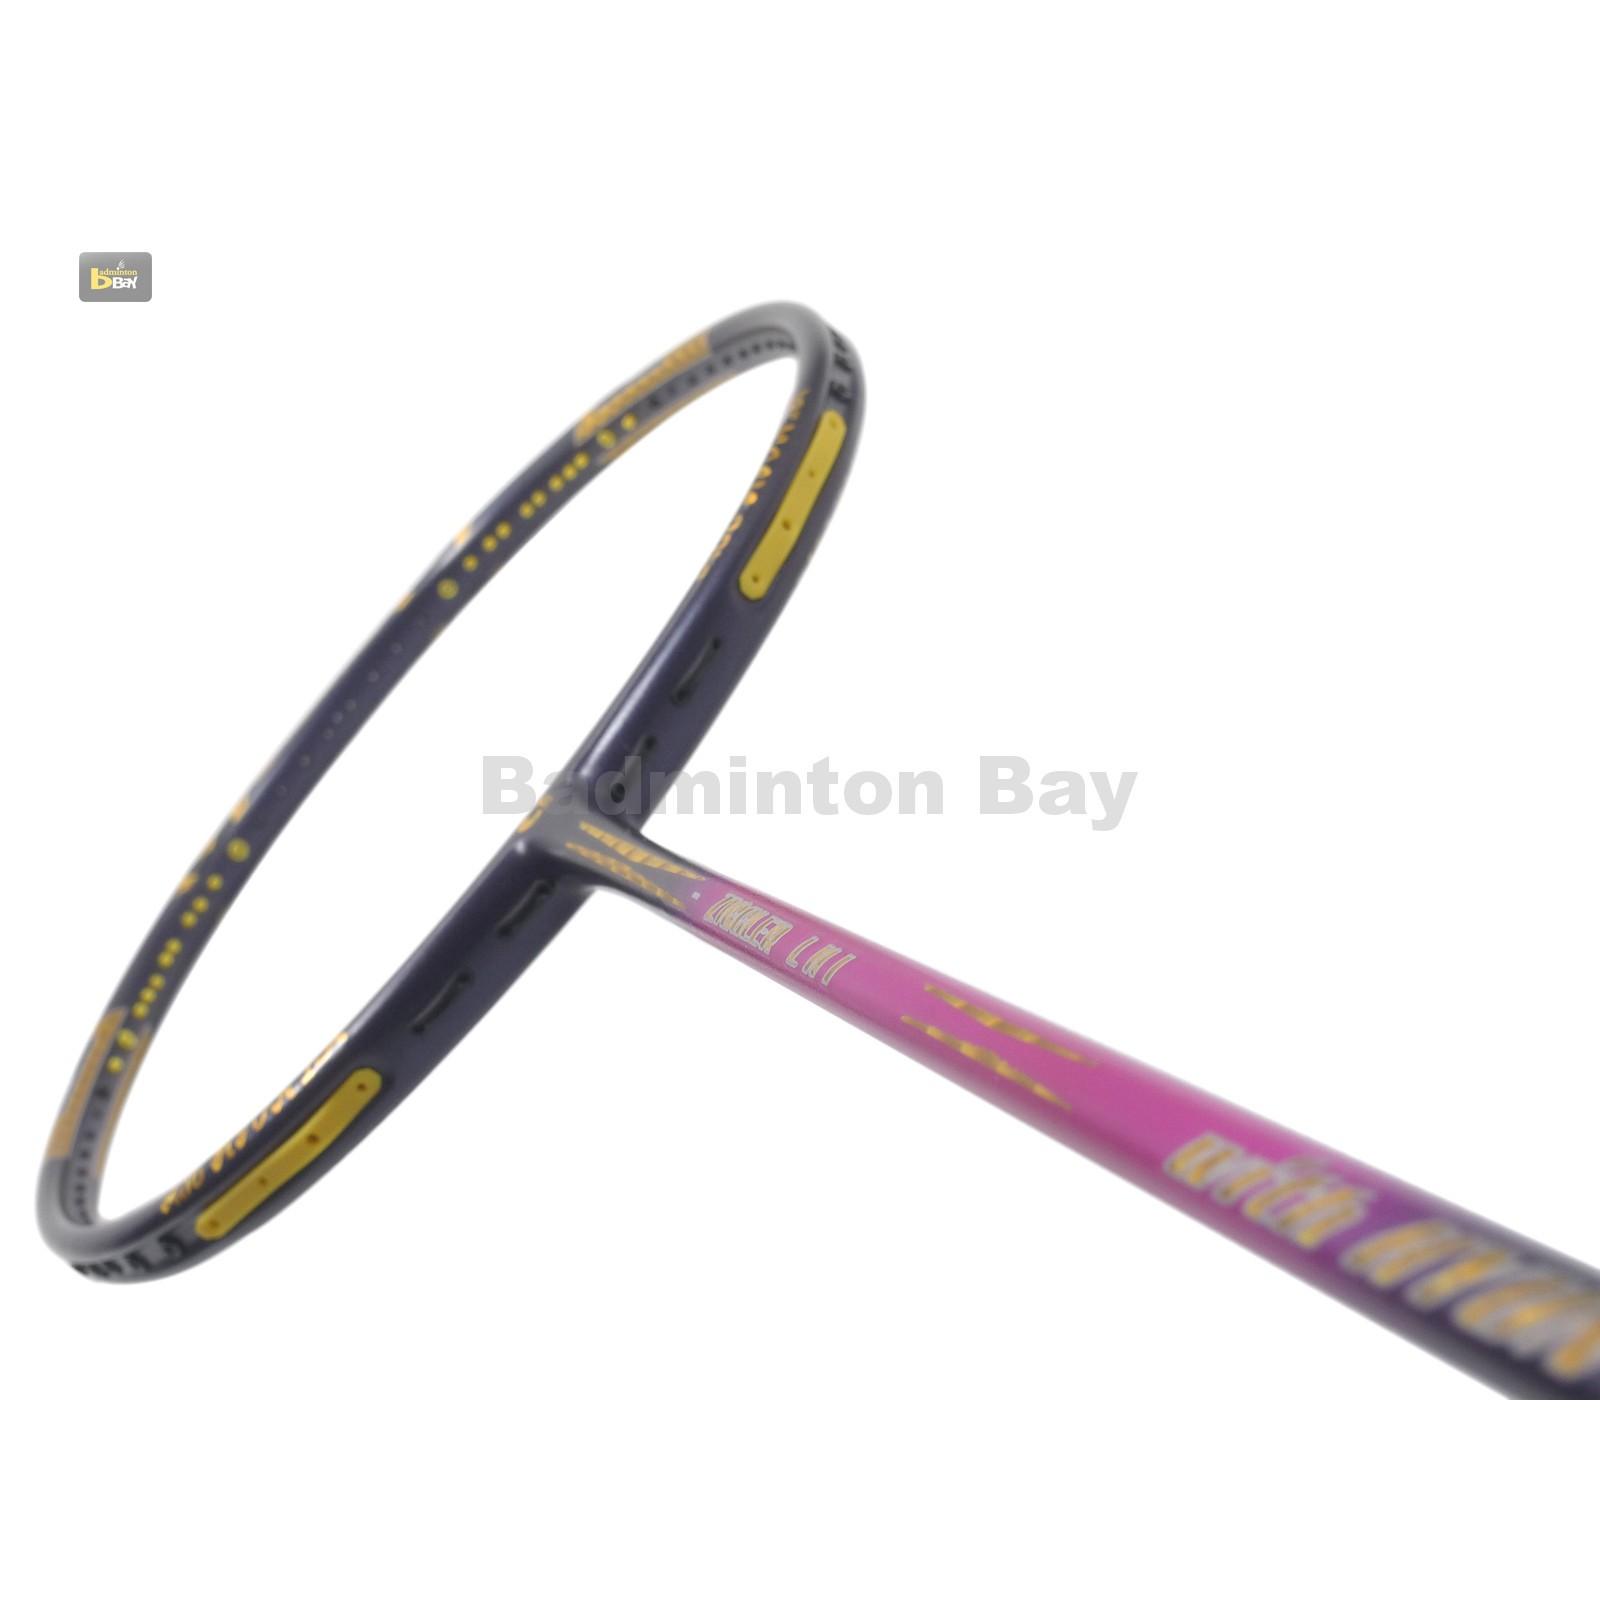 Apacs Ziggler LHI Lee Hyun il Badminton Racket pact Frame 3U